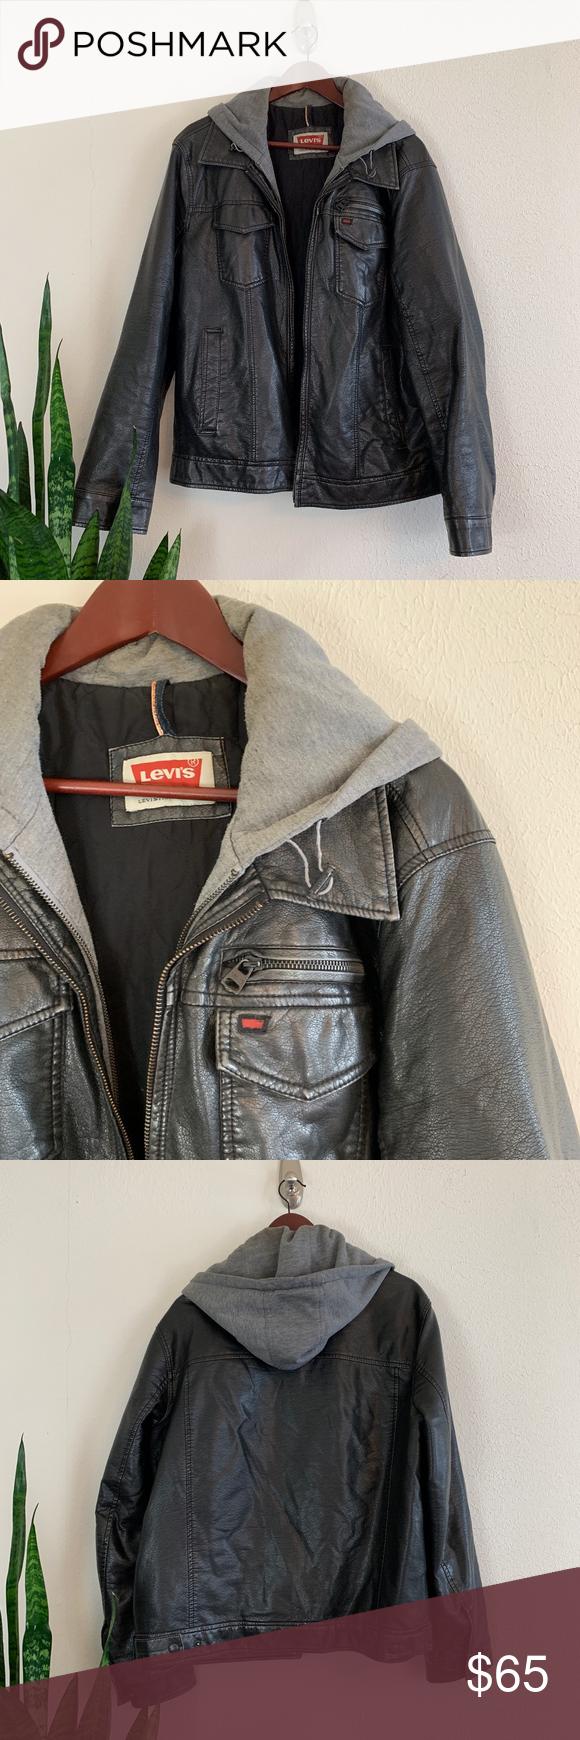 Levi S Men S Faux Leather Black Trucker Jacket Levi S Men S Faux Leather Two Pocket Trucker Hoodie Jacket With Quilted Li Leather Jacket Trucker Jacket Jackets [ 1740 x 580 Pixel ]